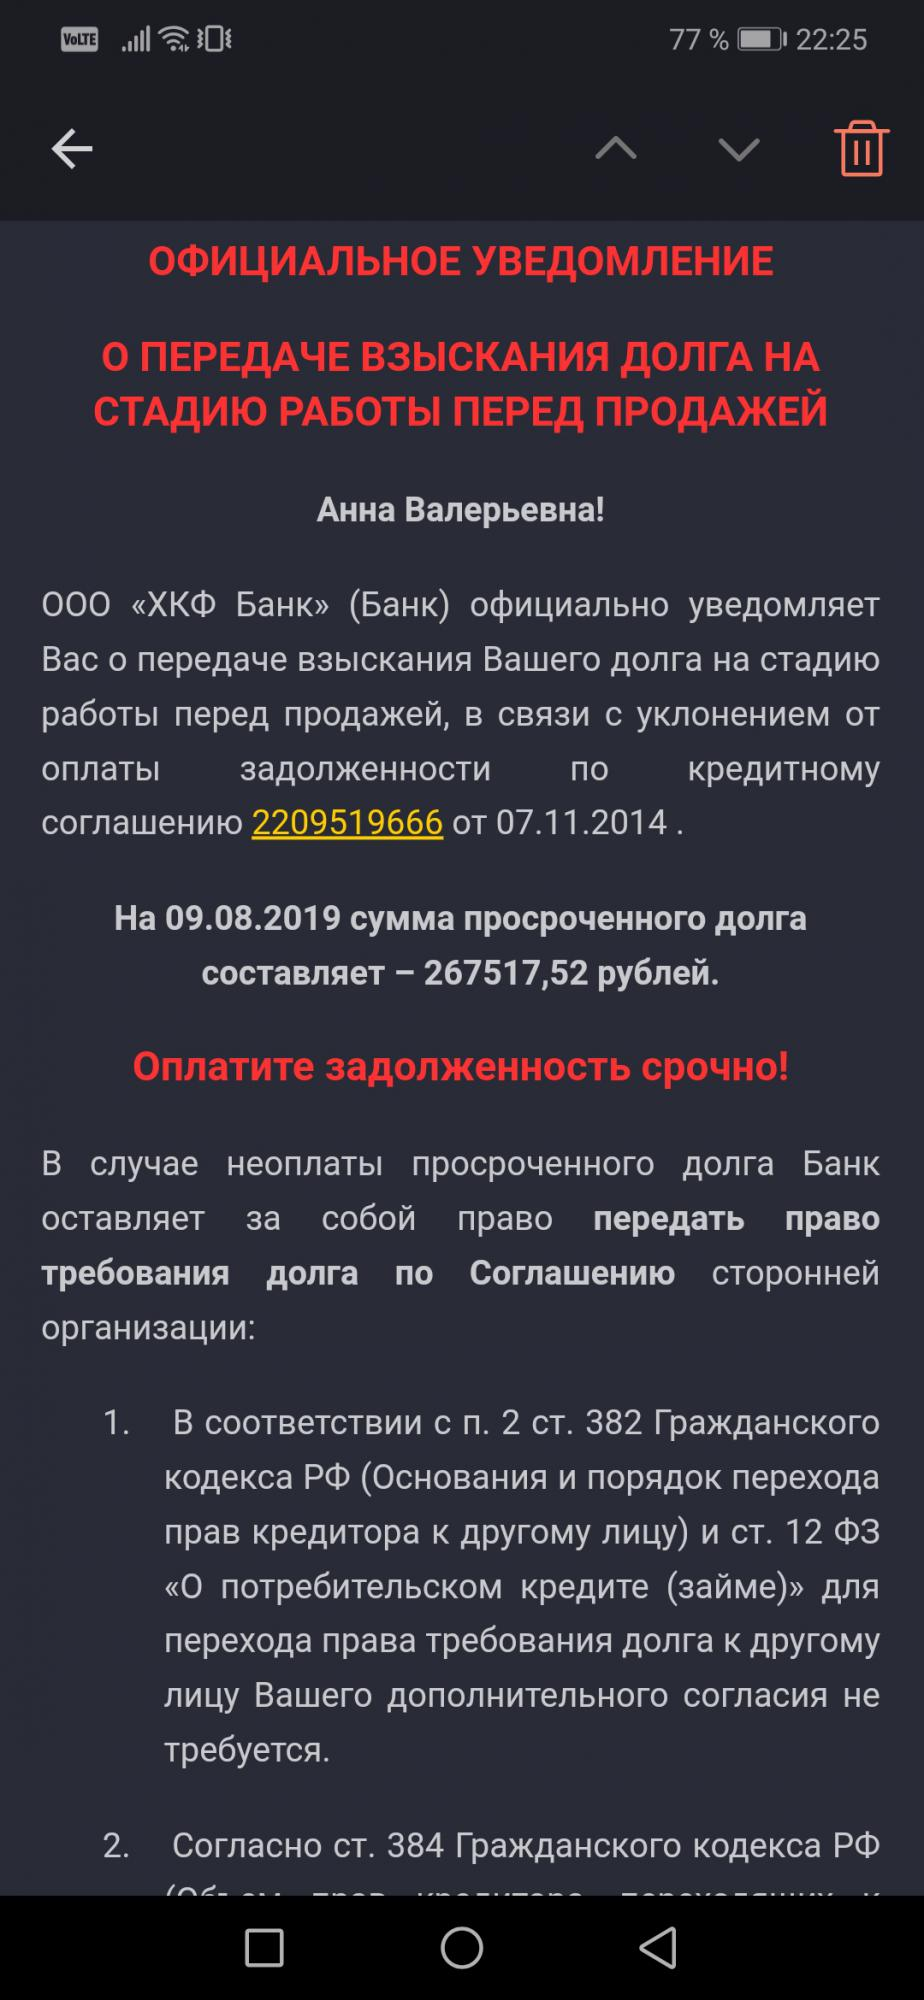 Screenshot_20200120_222538_ru.yandex.mail.jpg